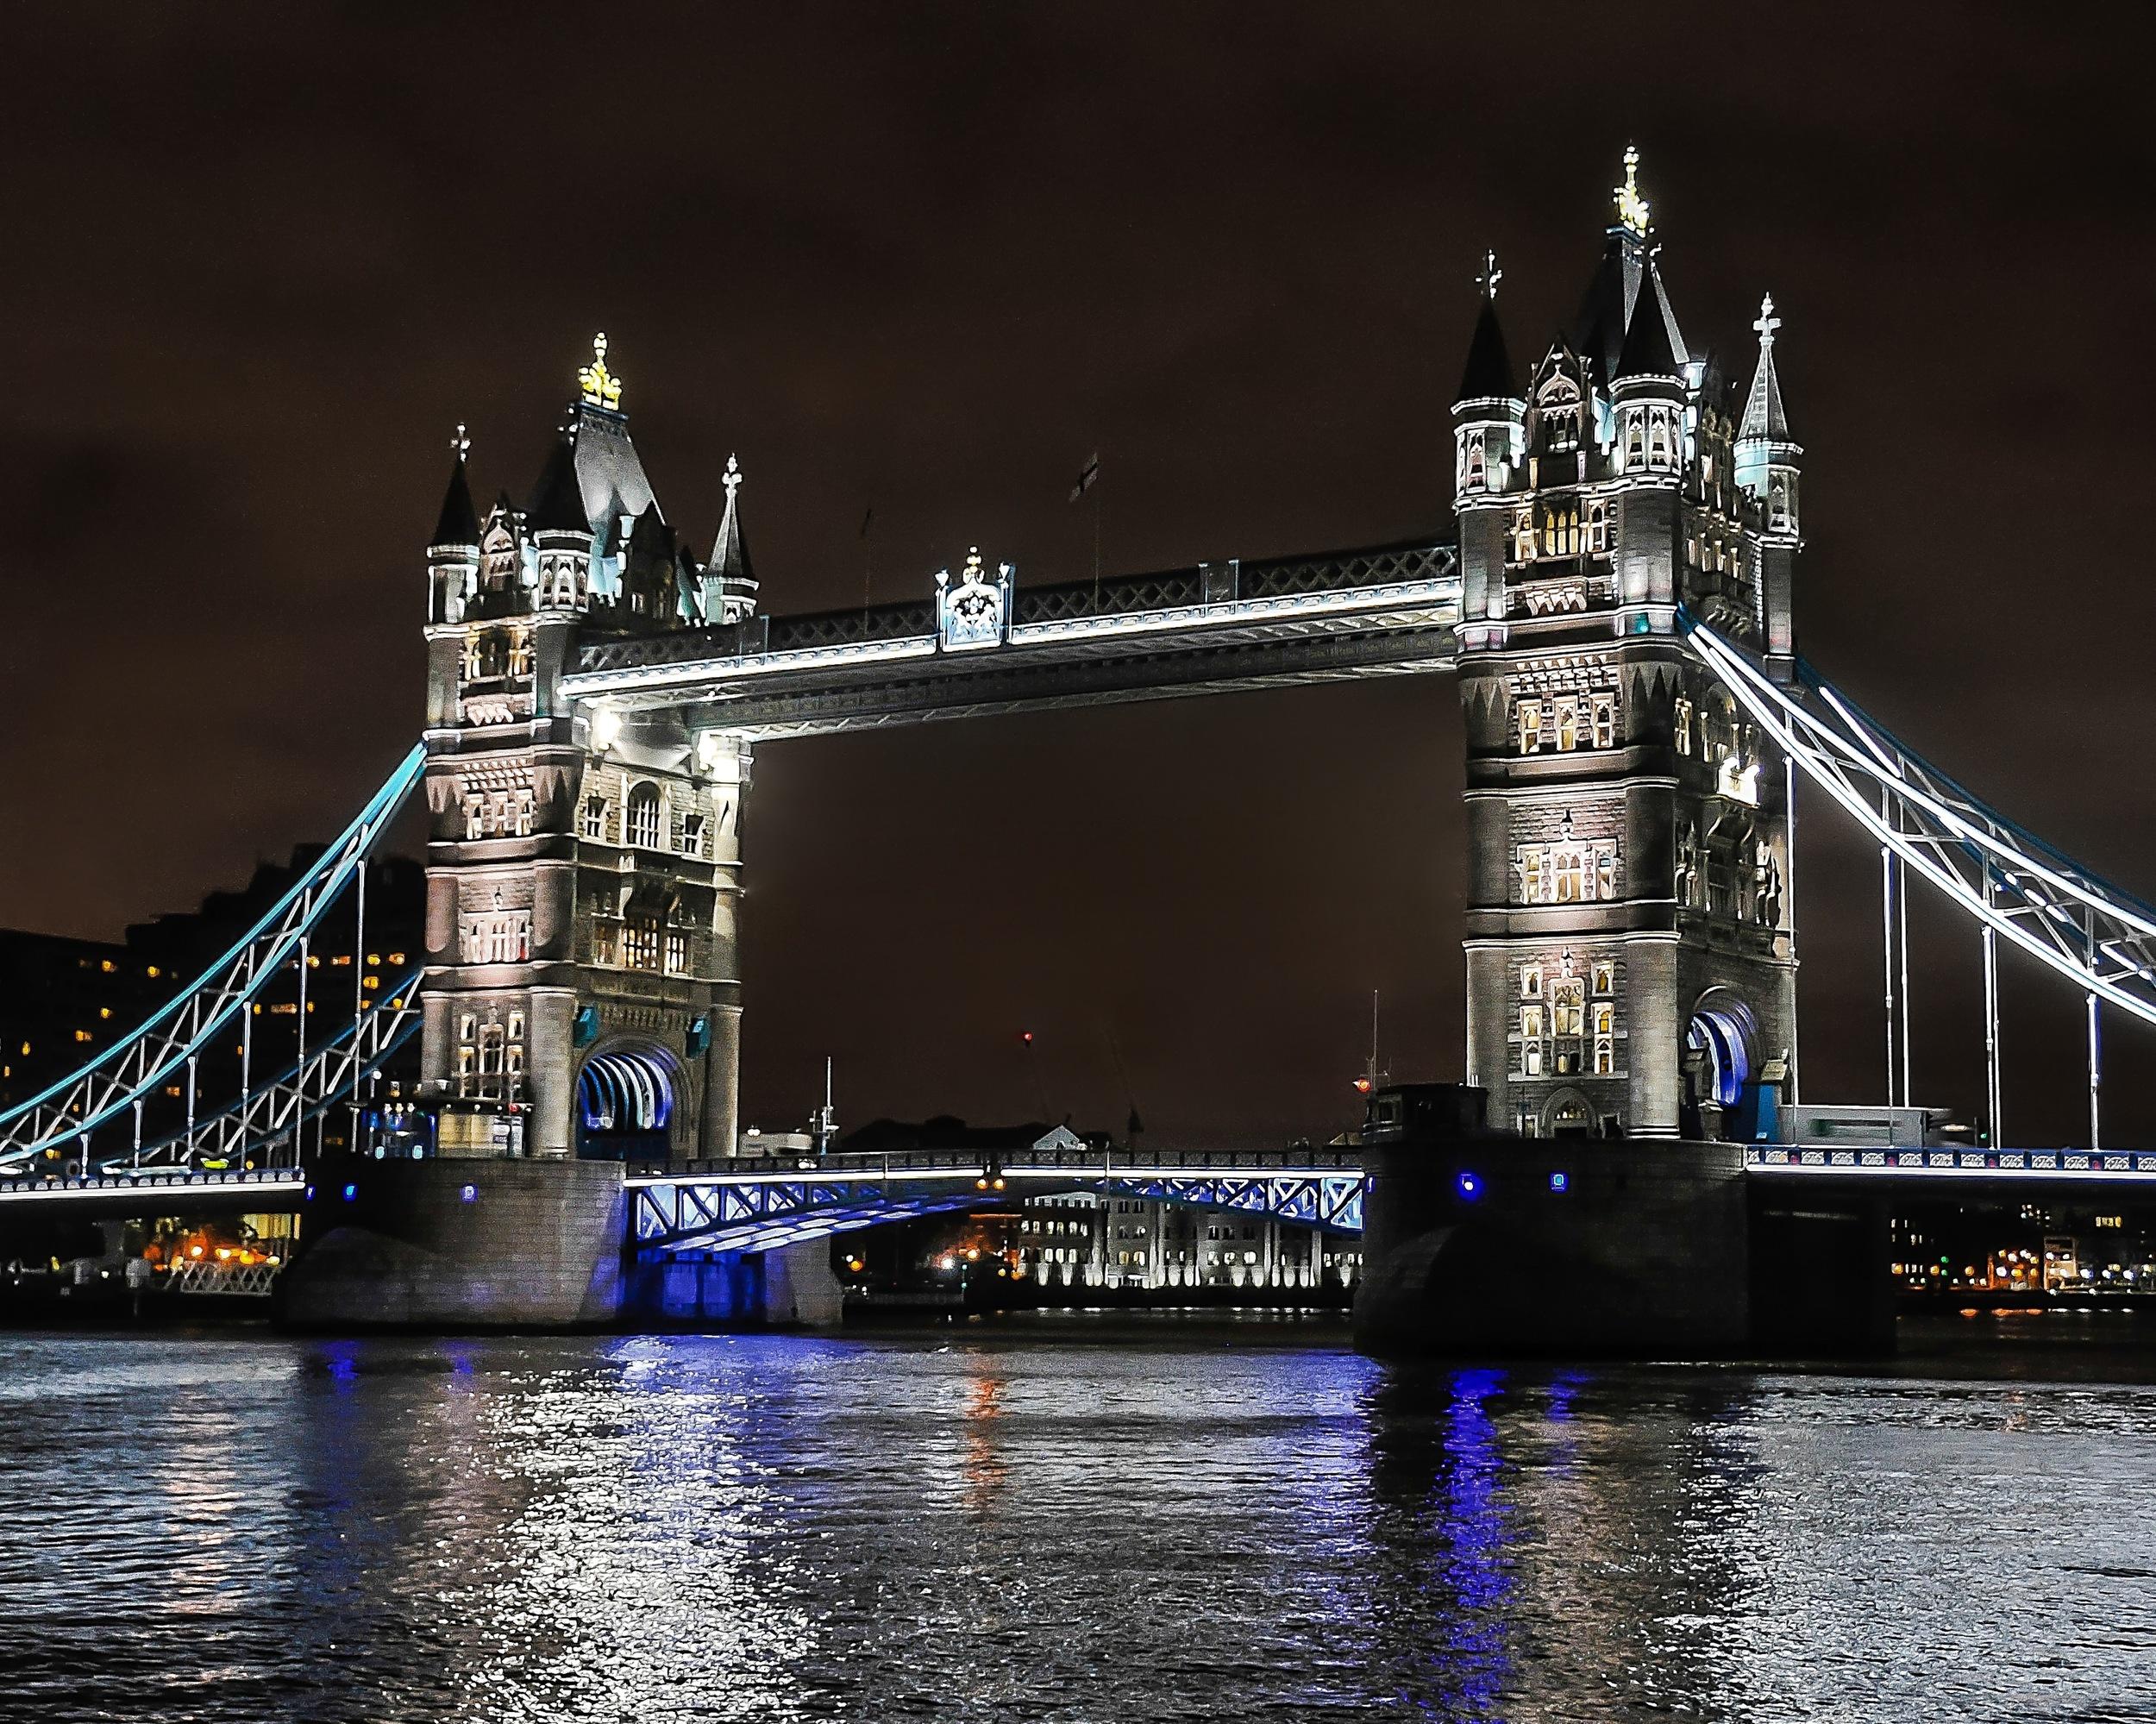 Iconic London - Tower Bridge (London, England)